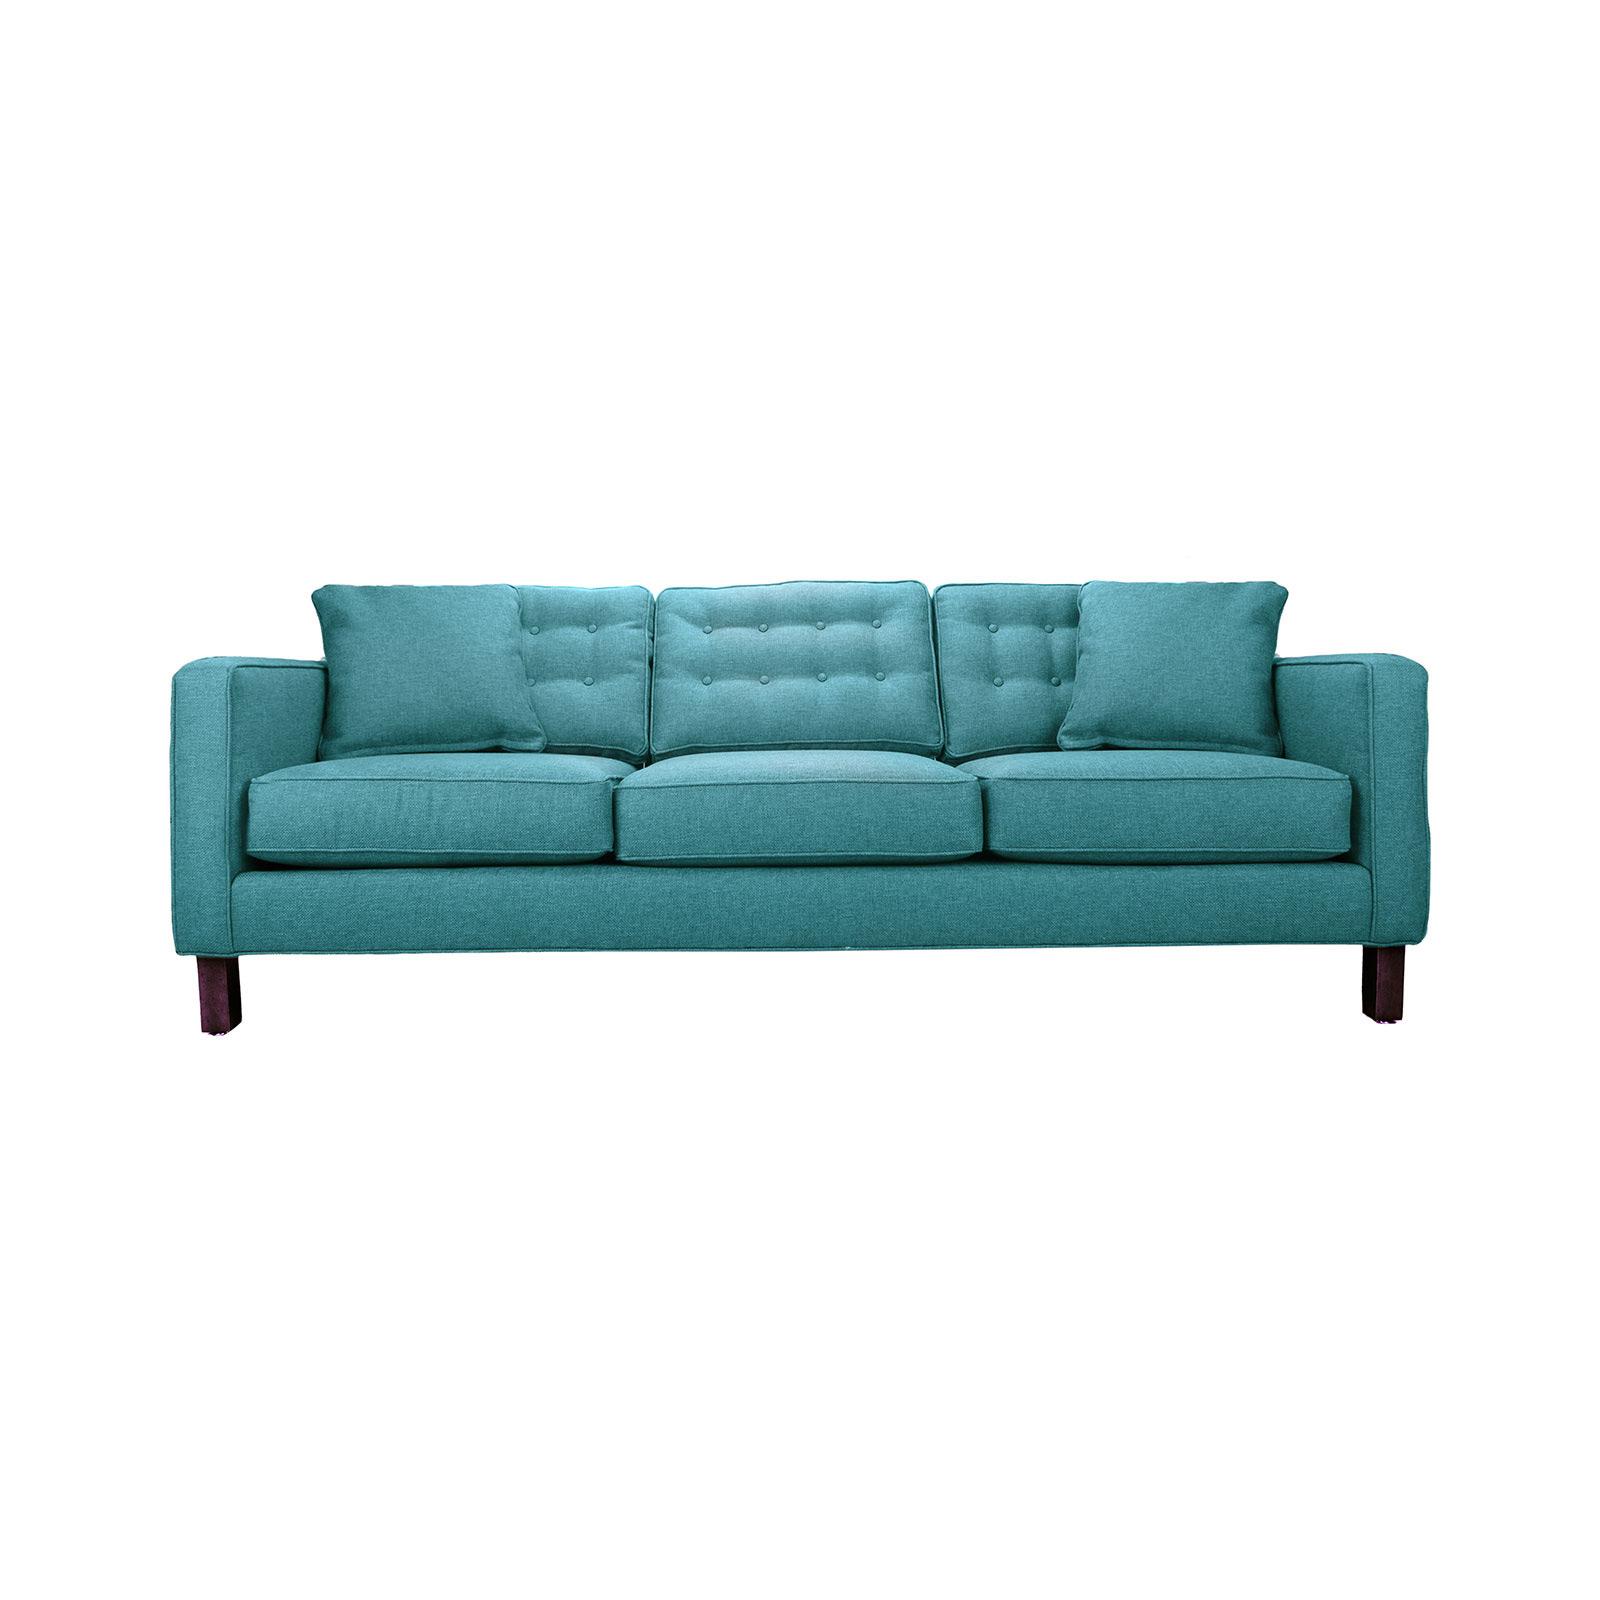 edith-sofa-dot-bo.jpg